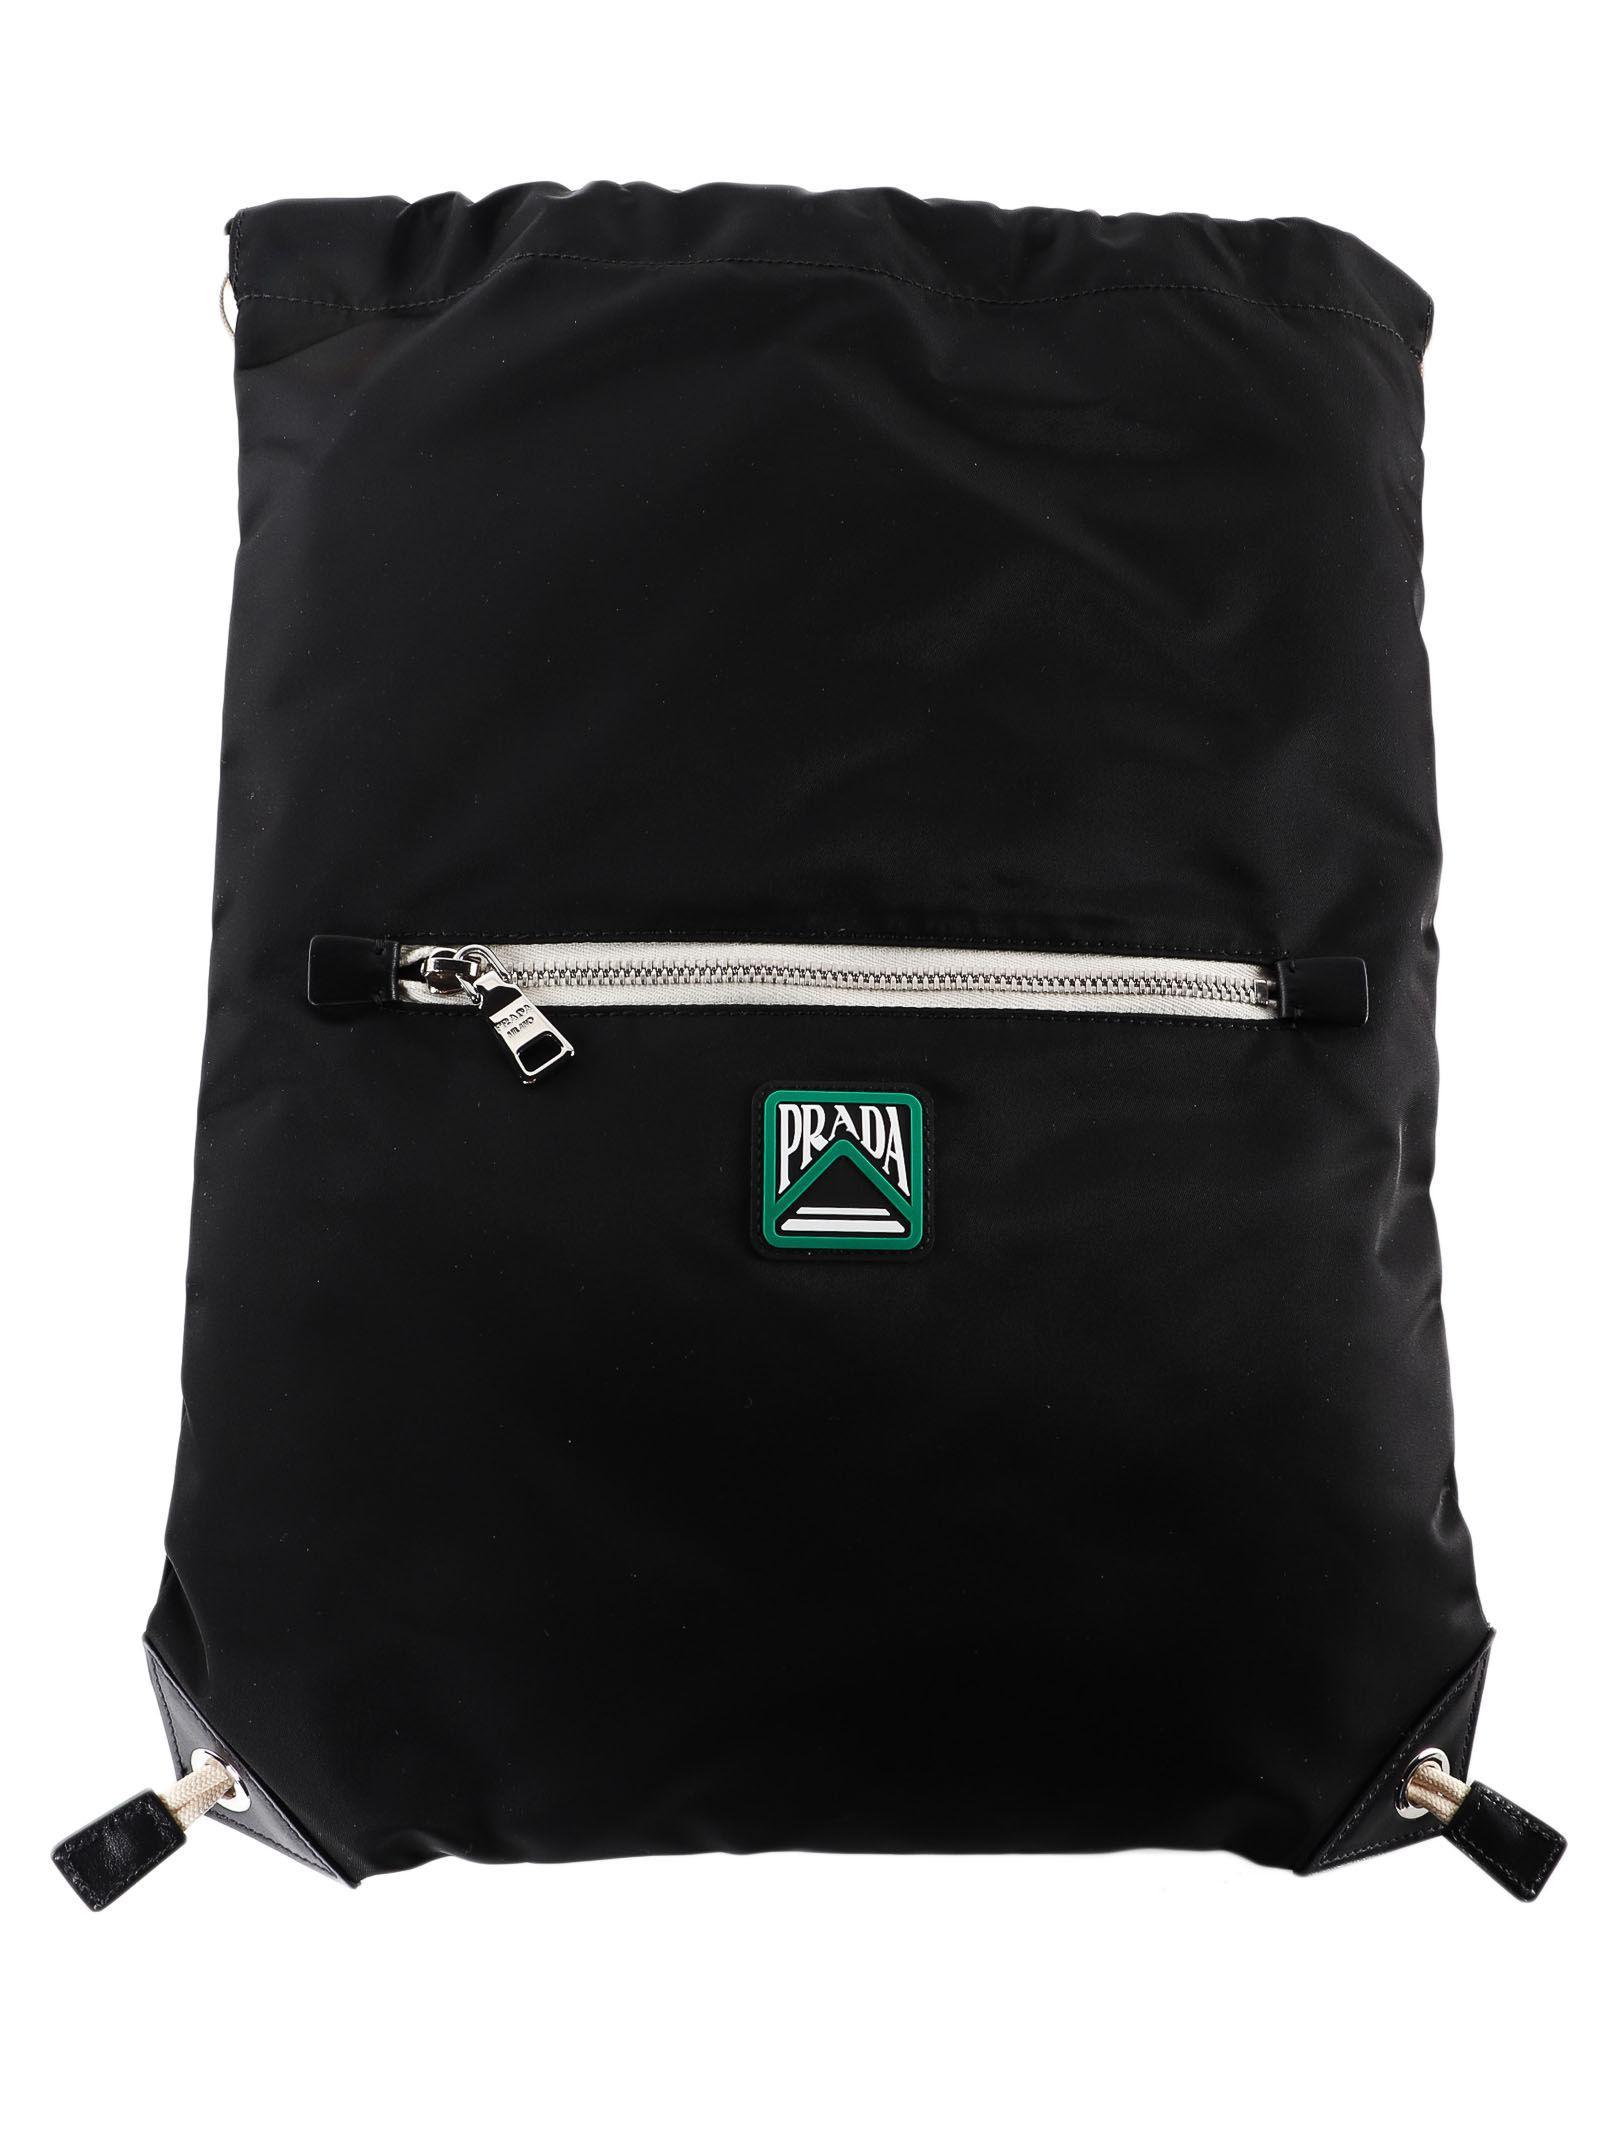 ee777088b9ac Lyst - Prada Backpack Tessuto in Black for Men